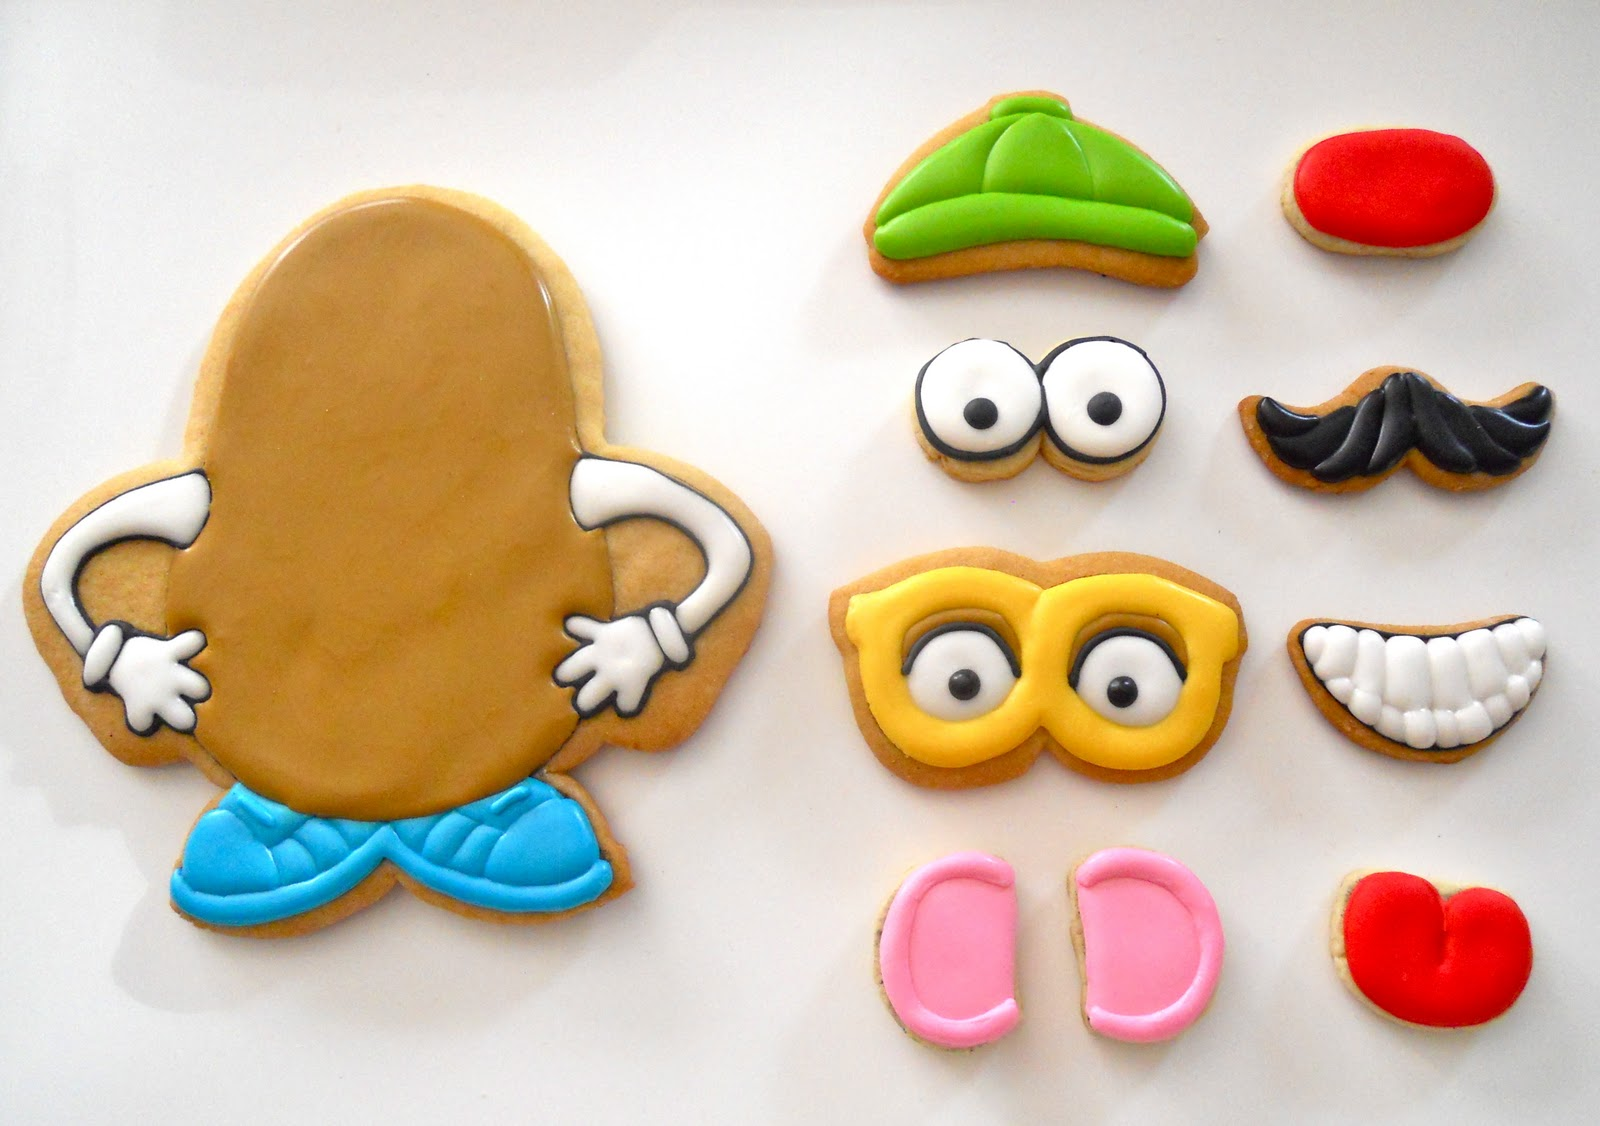 Mr. Potato Head sugar cookies